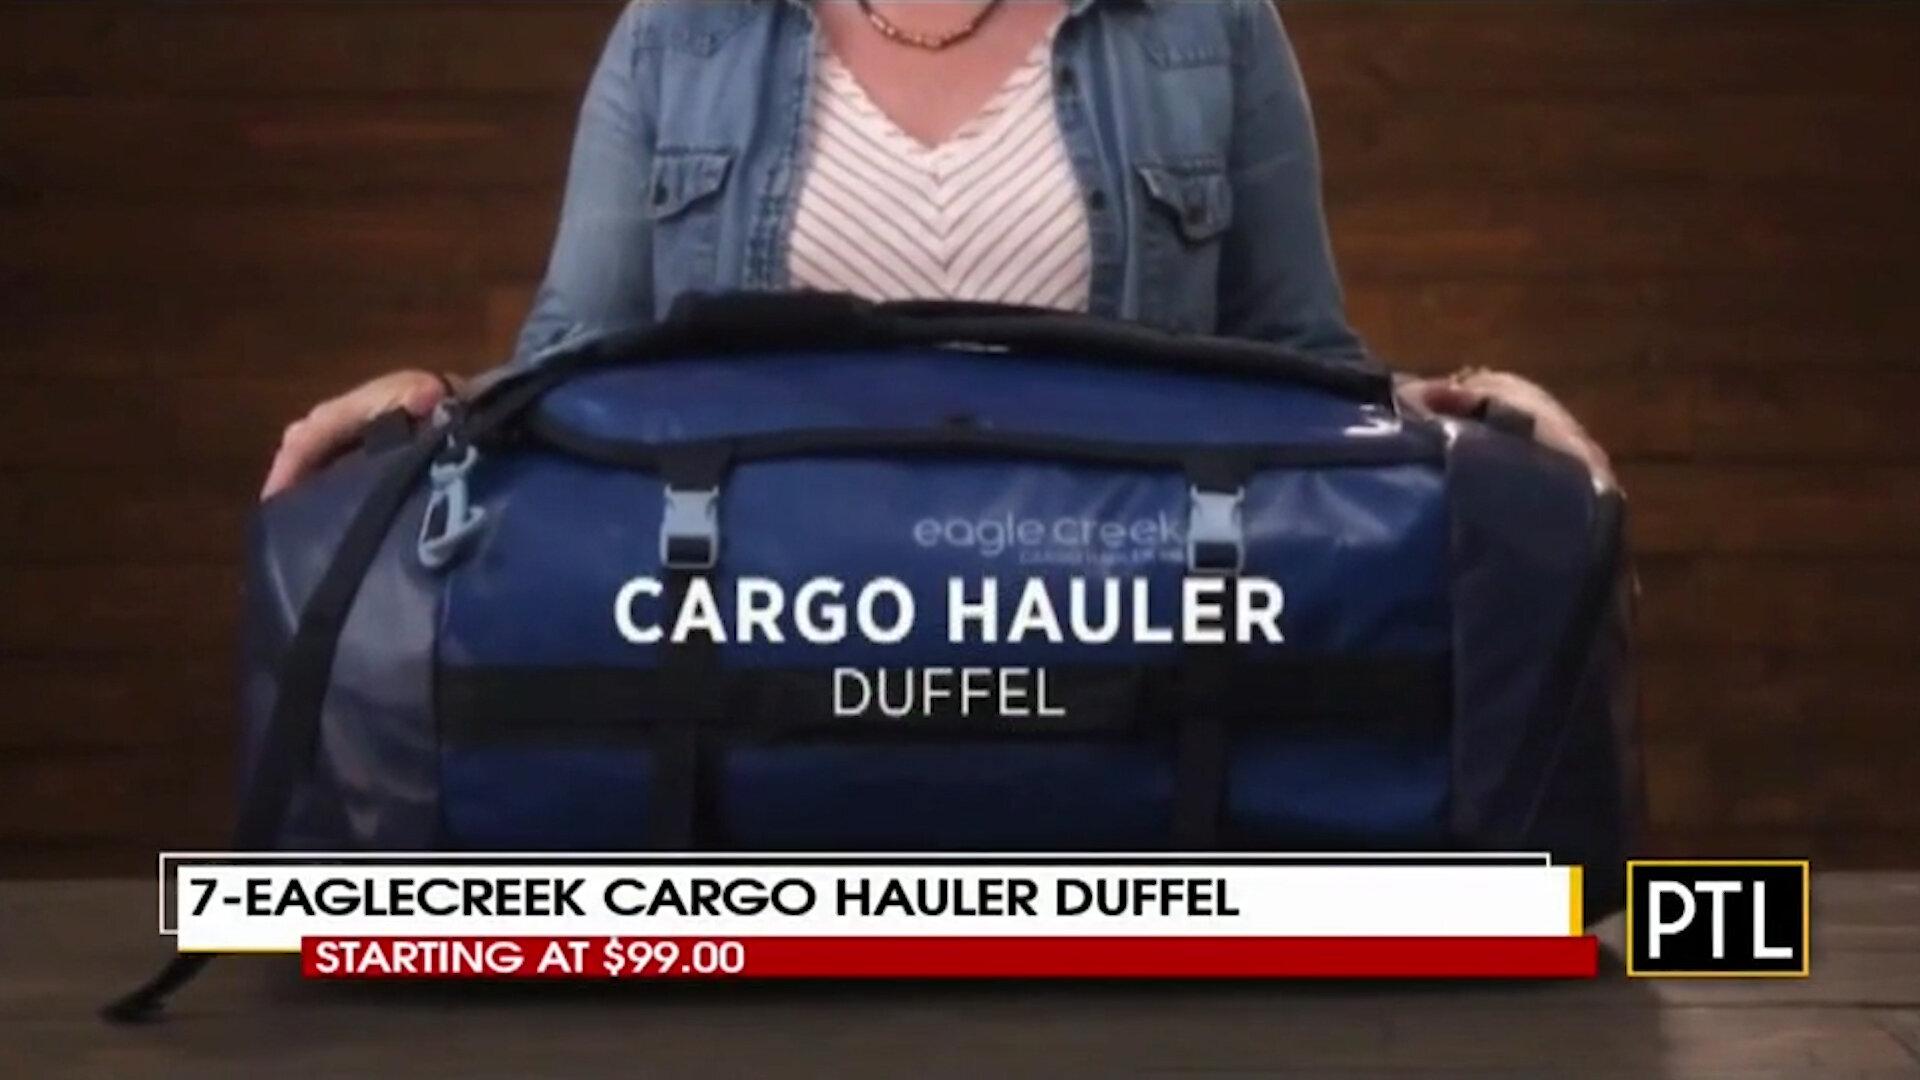 EAGLECREEK CARGO HAULER DUFFEL - Starting at $99.00Shop Now